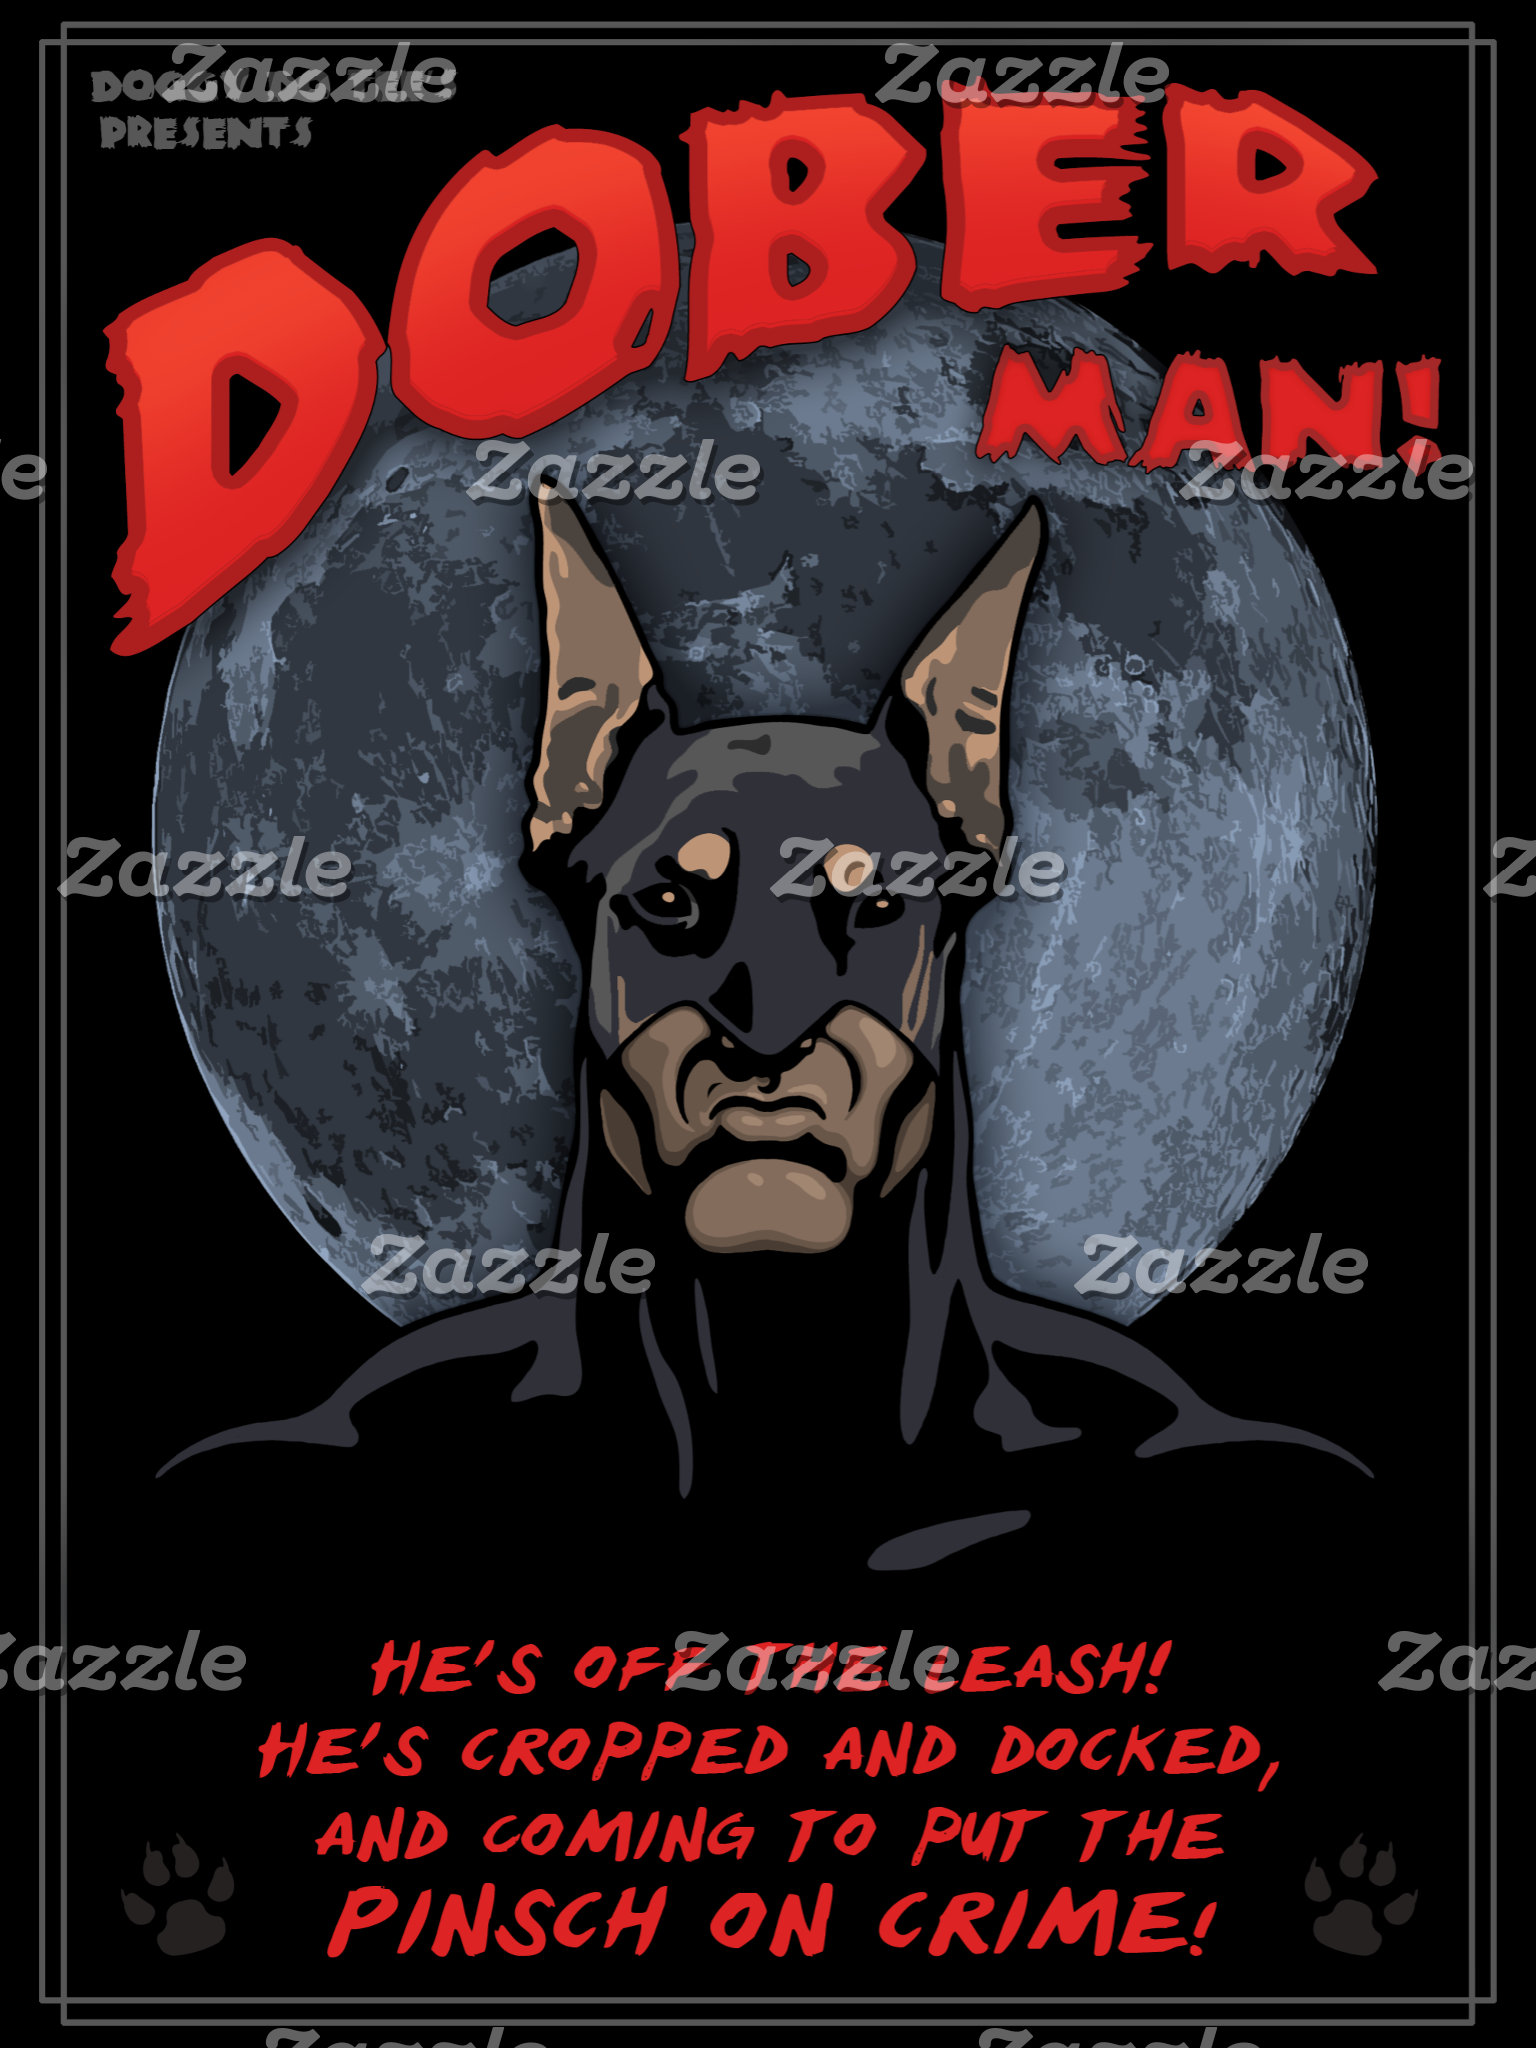 Dober Man!